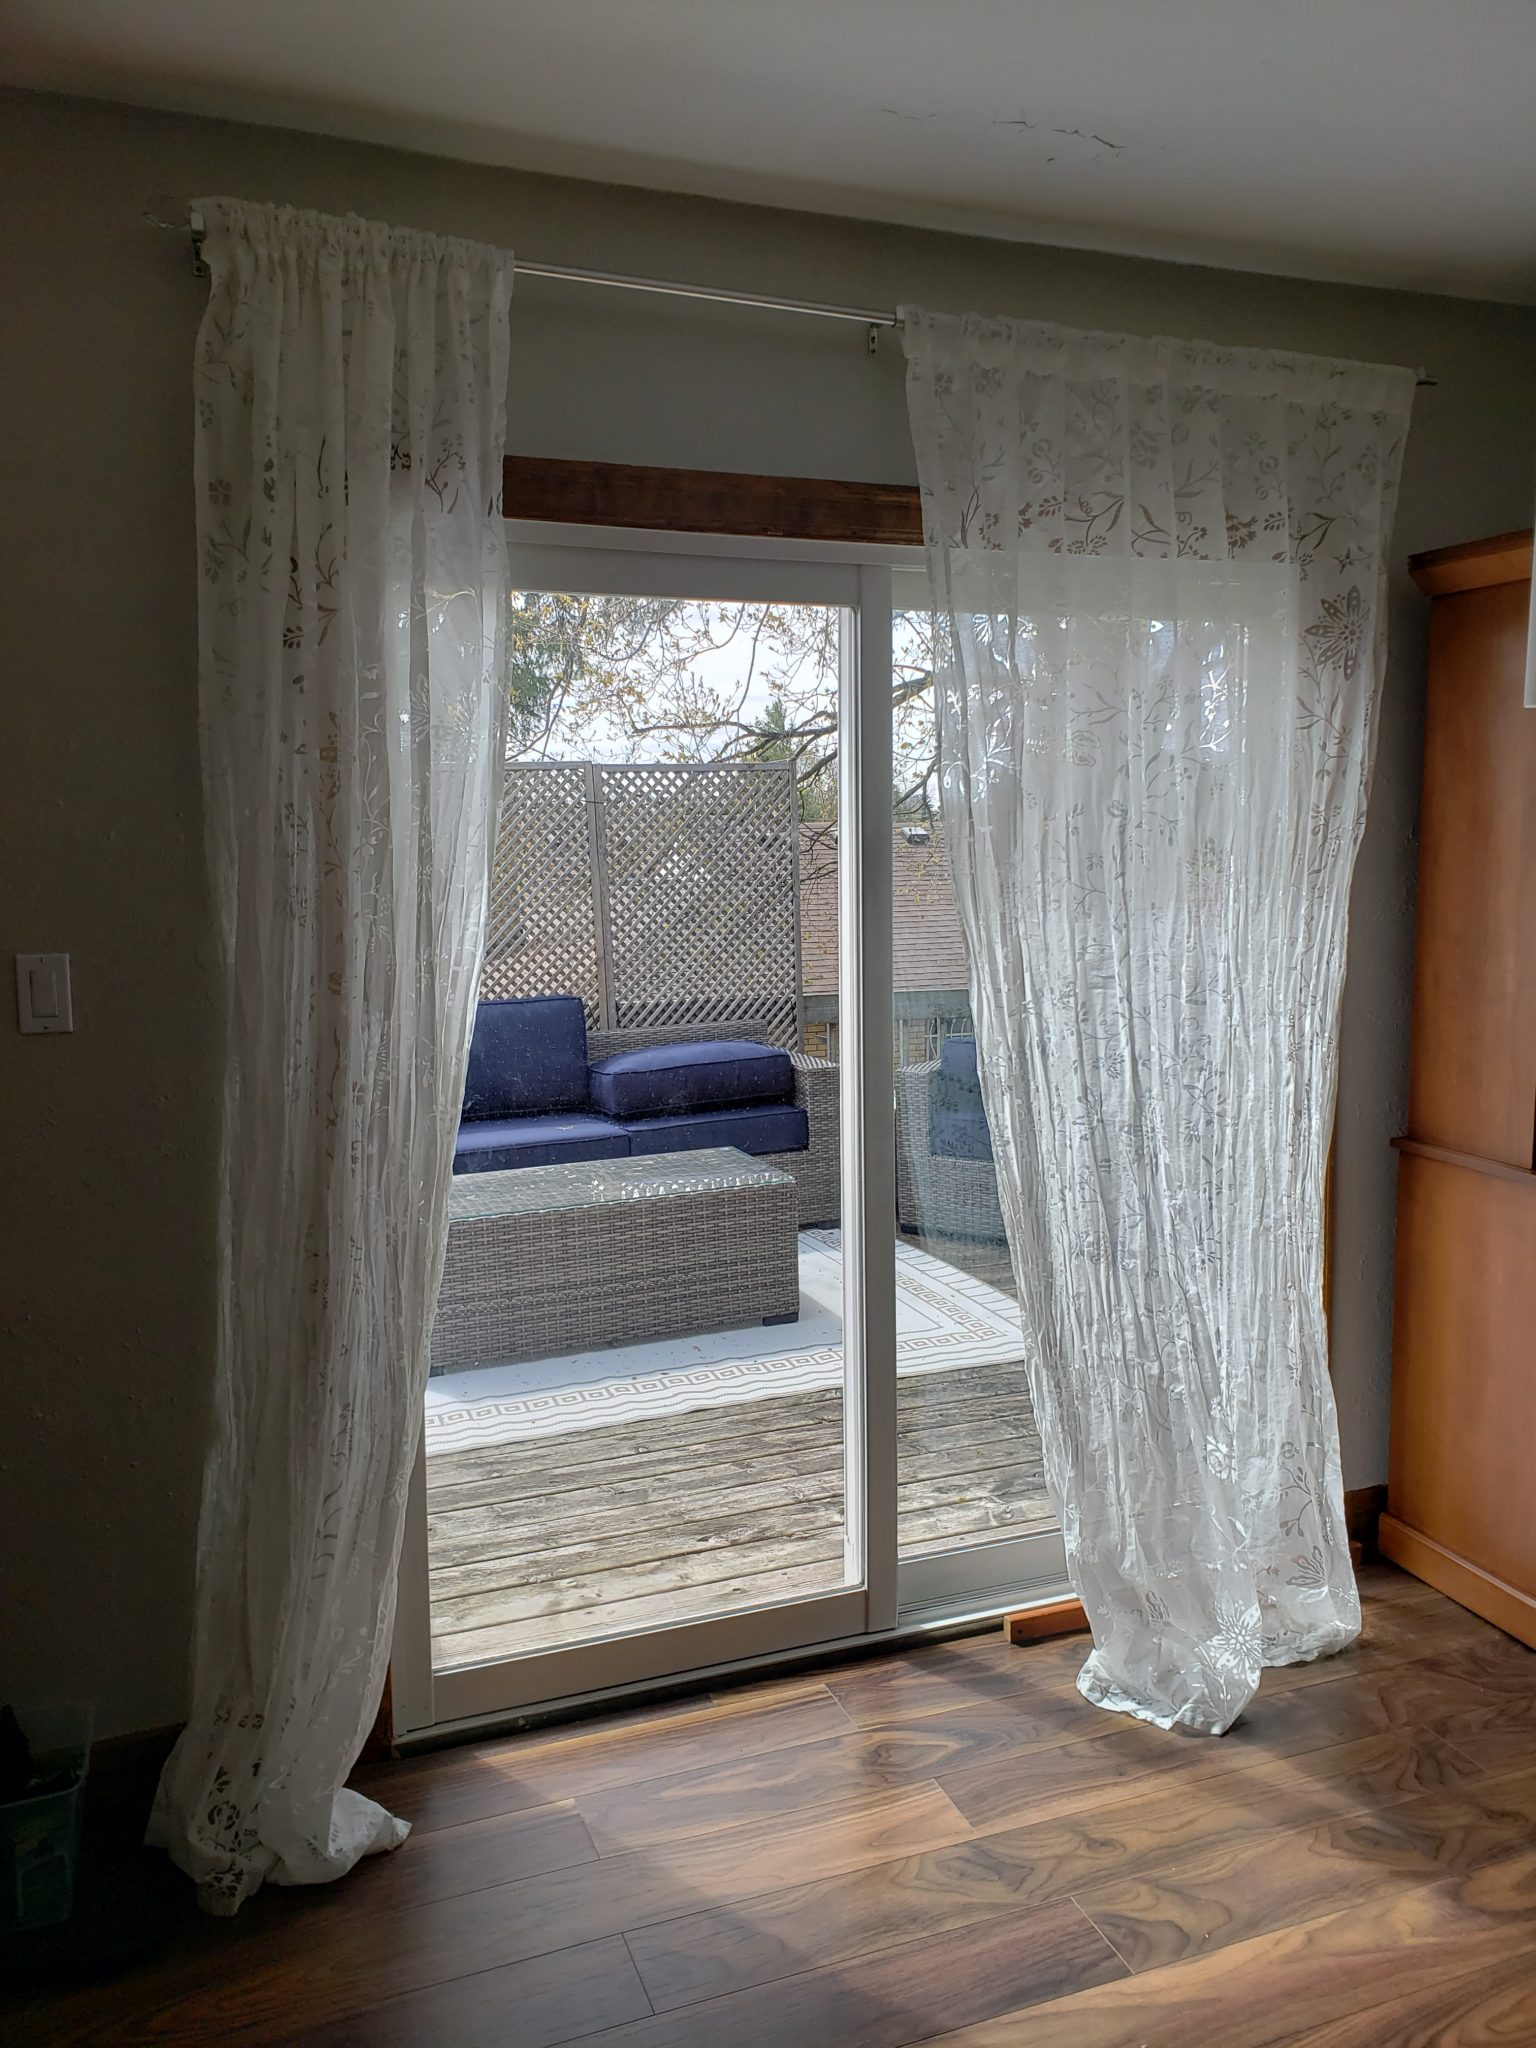 Patio door curtains - Before